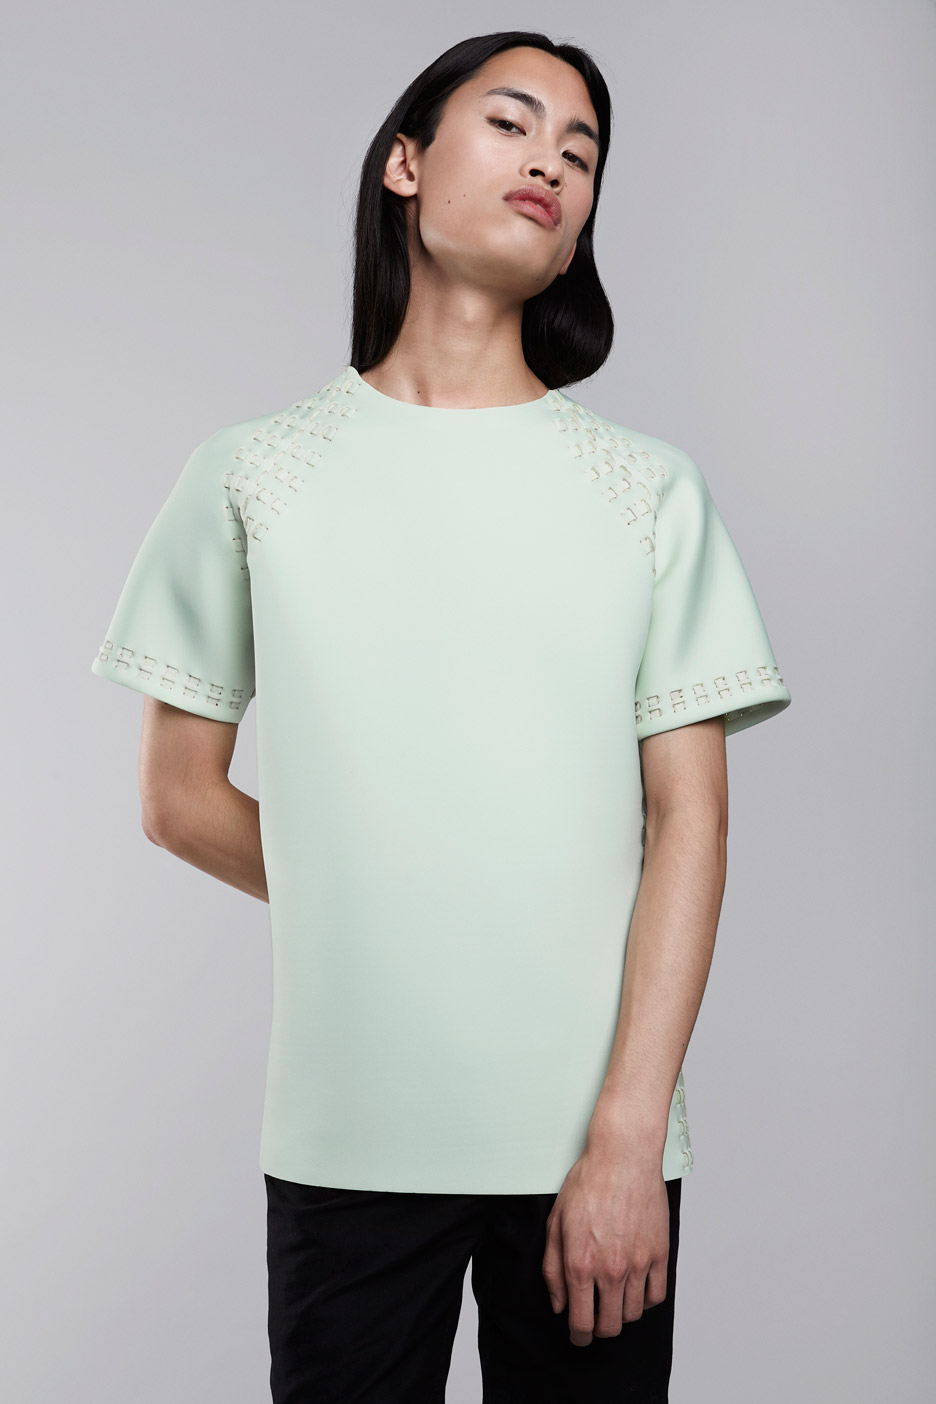 Martijn-van-Strien-The-Post-Couture-Collective-3